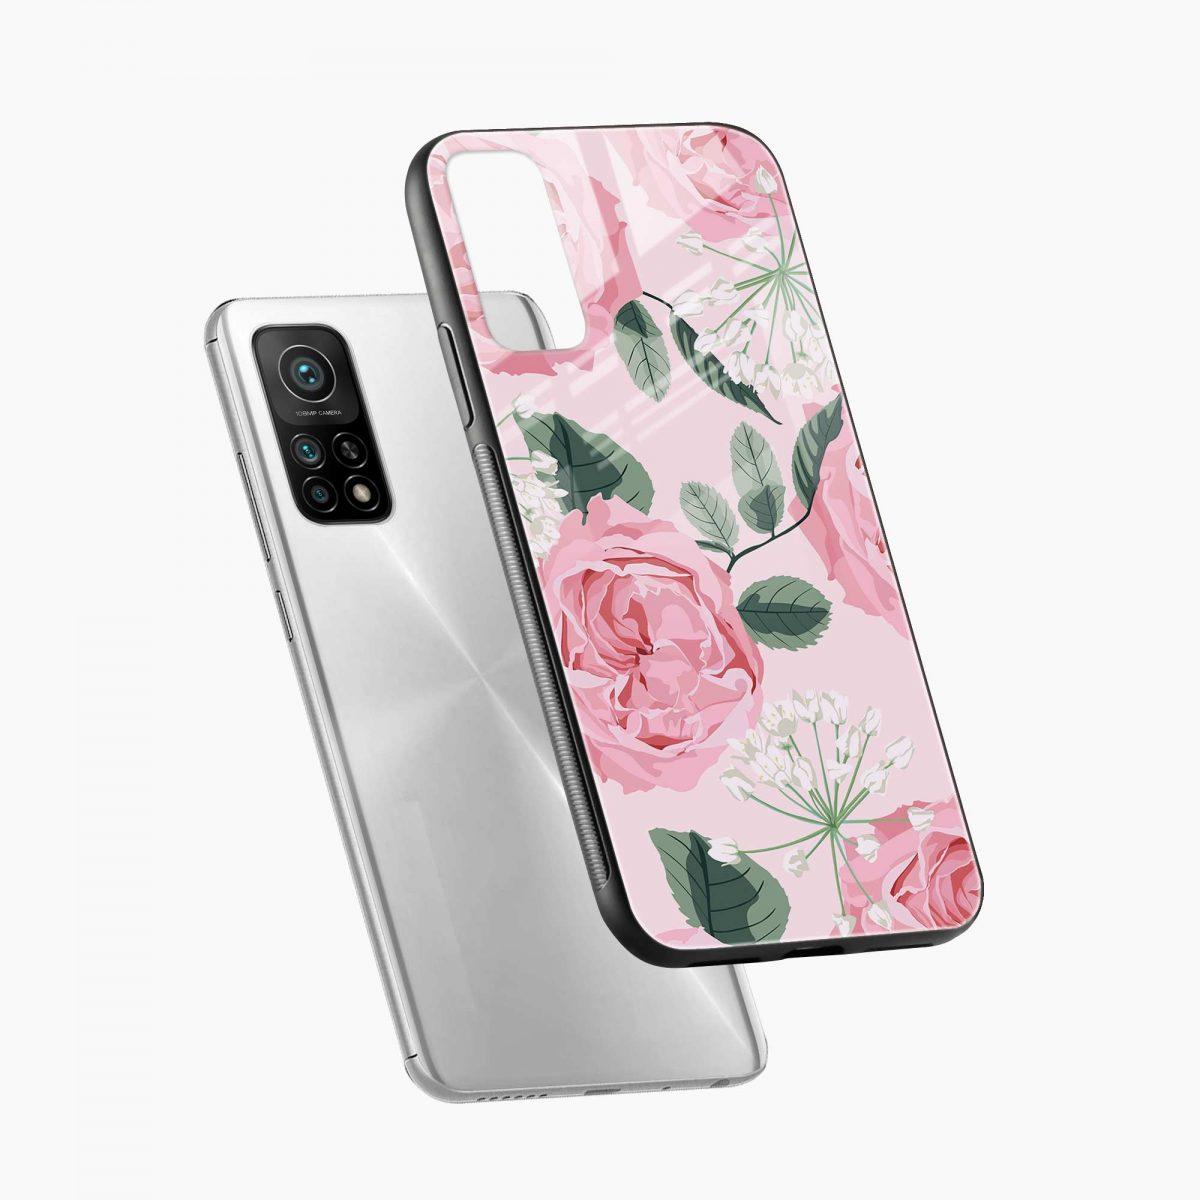 pink floral girlish xiaomi mi 10t pro back cover diagonal view